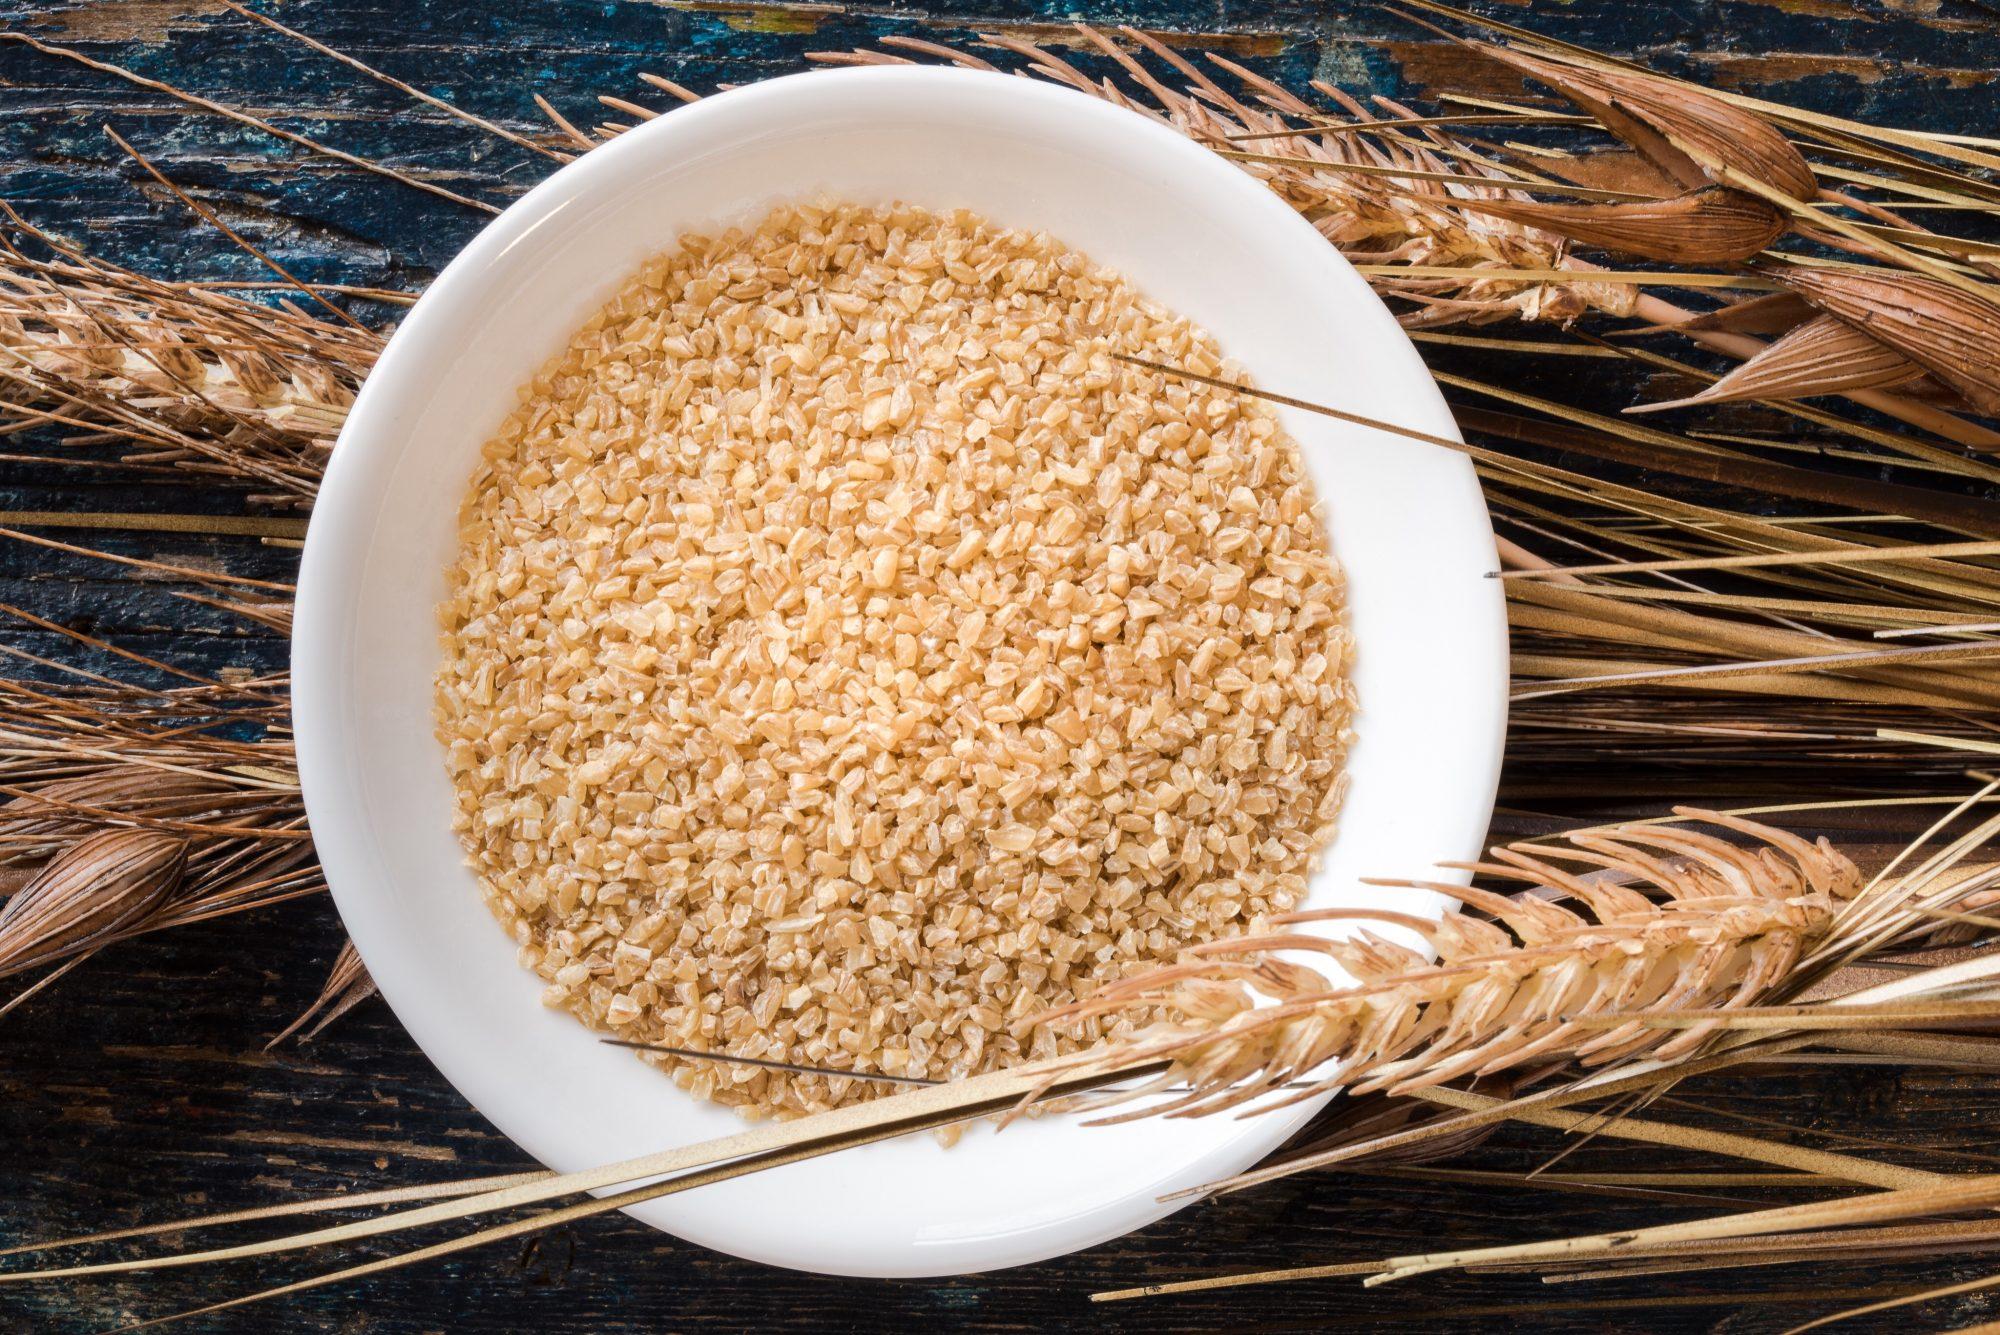 Bulgur Wheat Getty 5/15/20